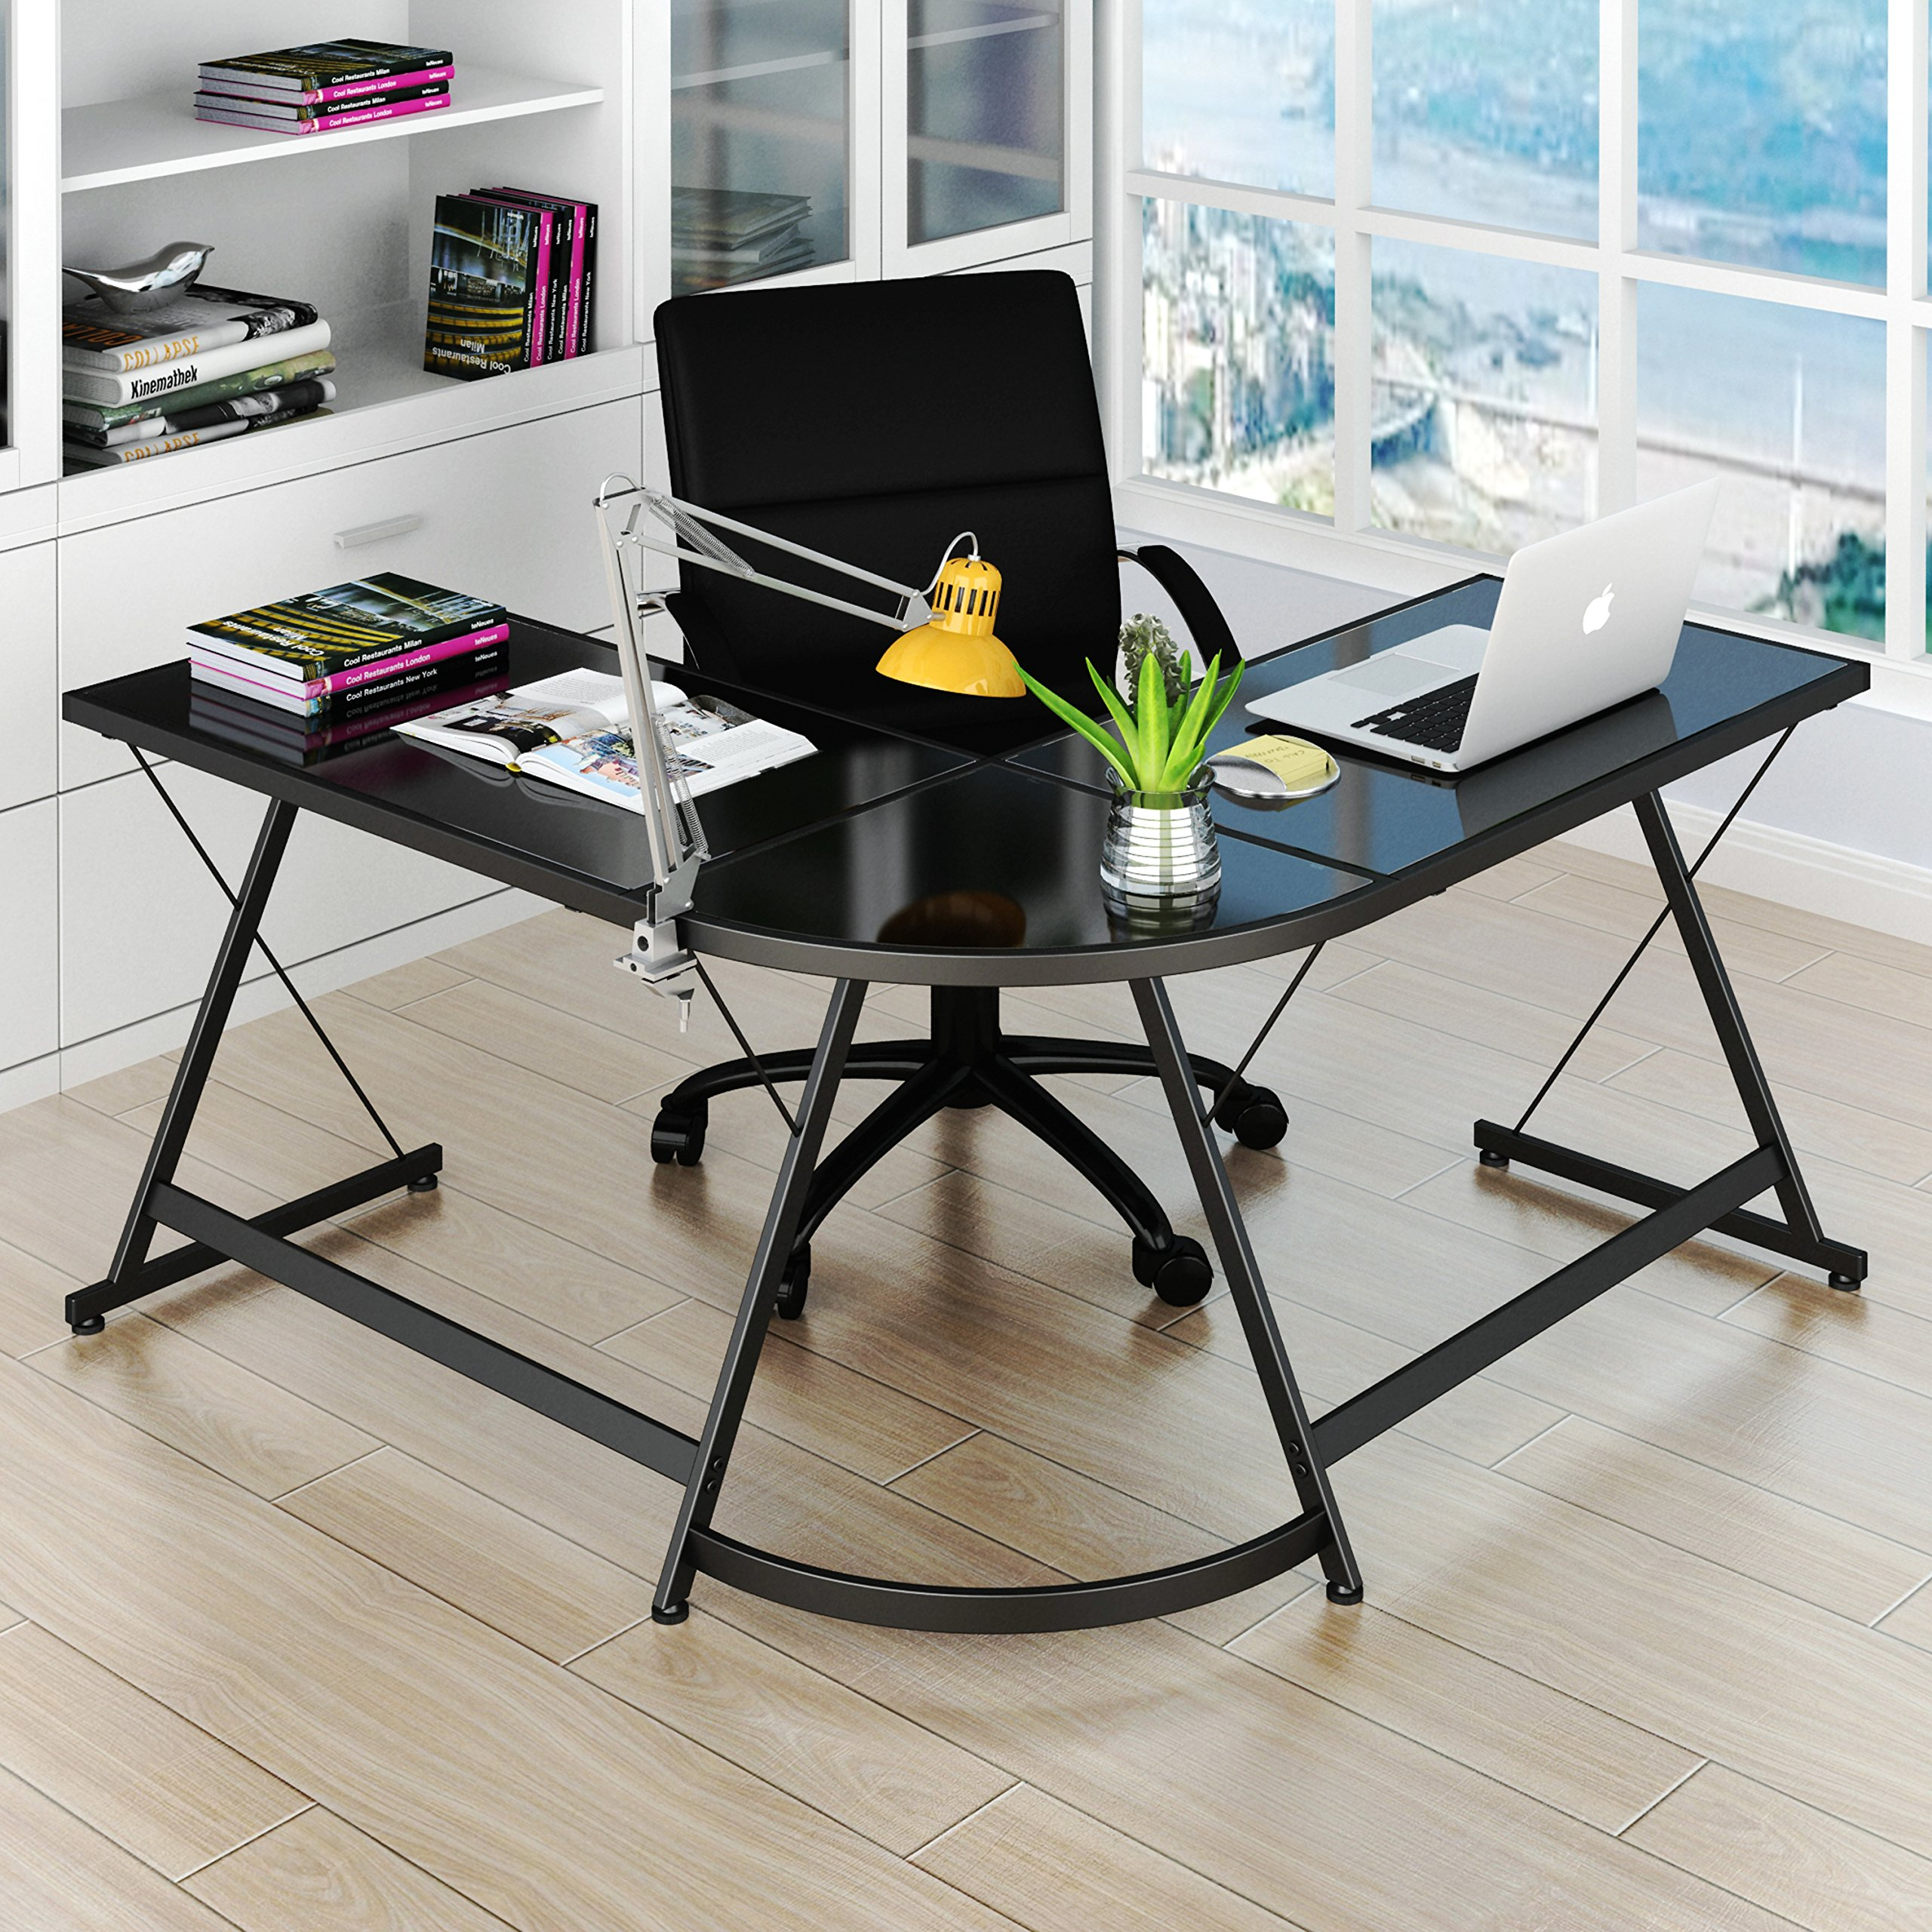 SHW L-Shaped Home Office Corner Desk by SHW (Image #2)